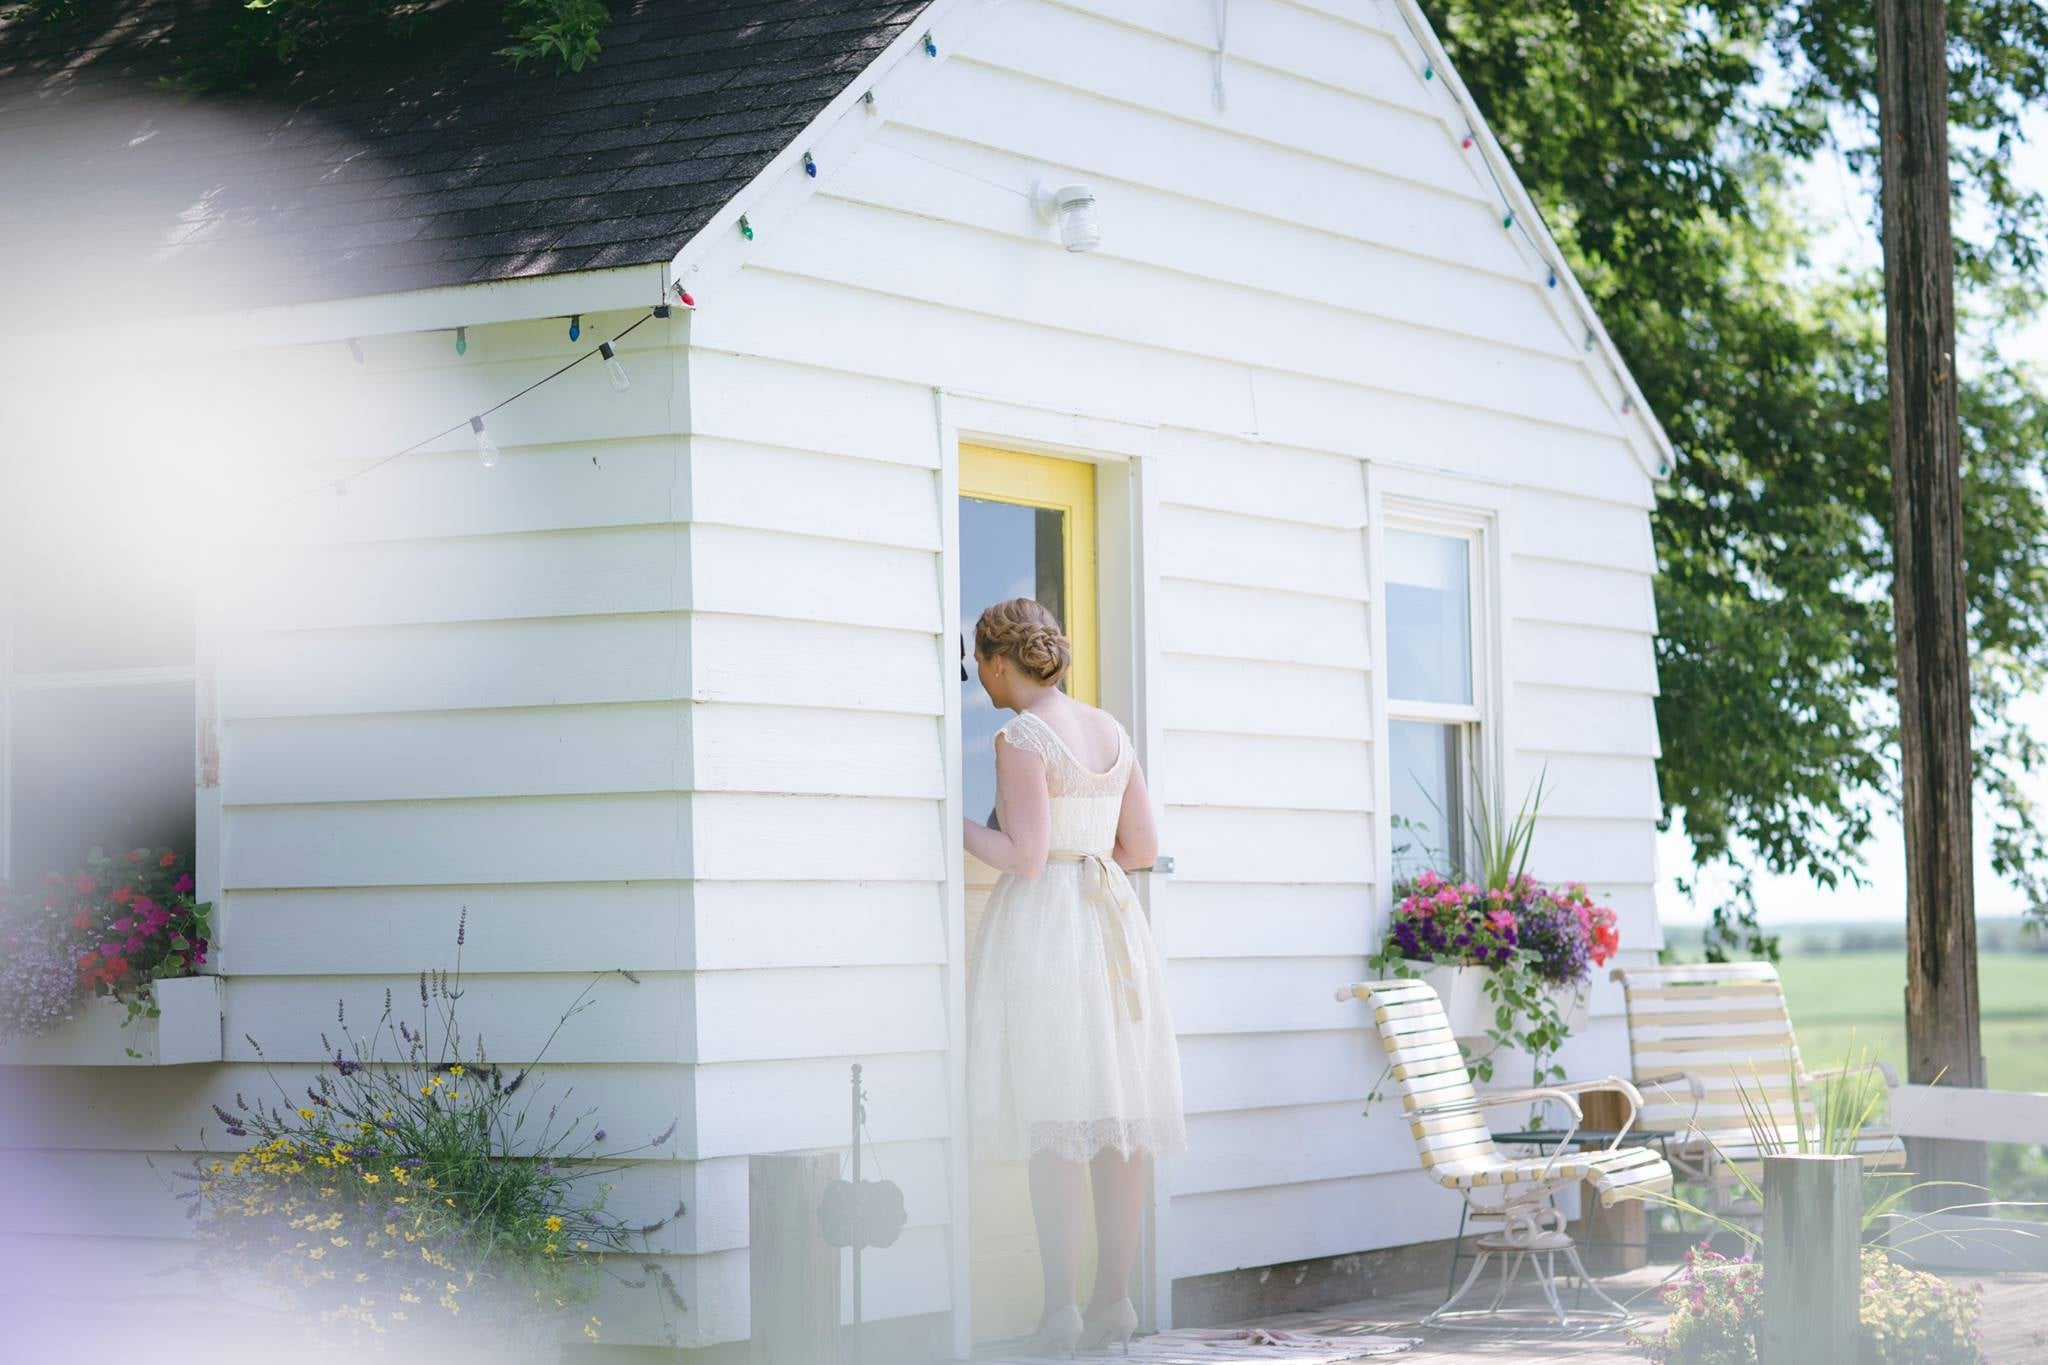 Wedding First Look at Legacy Hill Farm